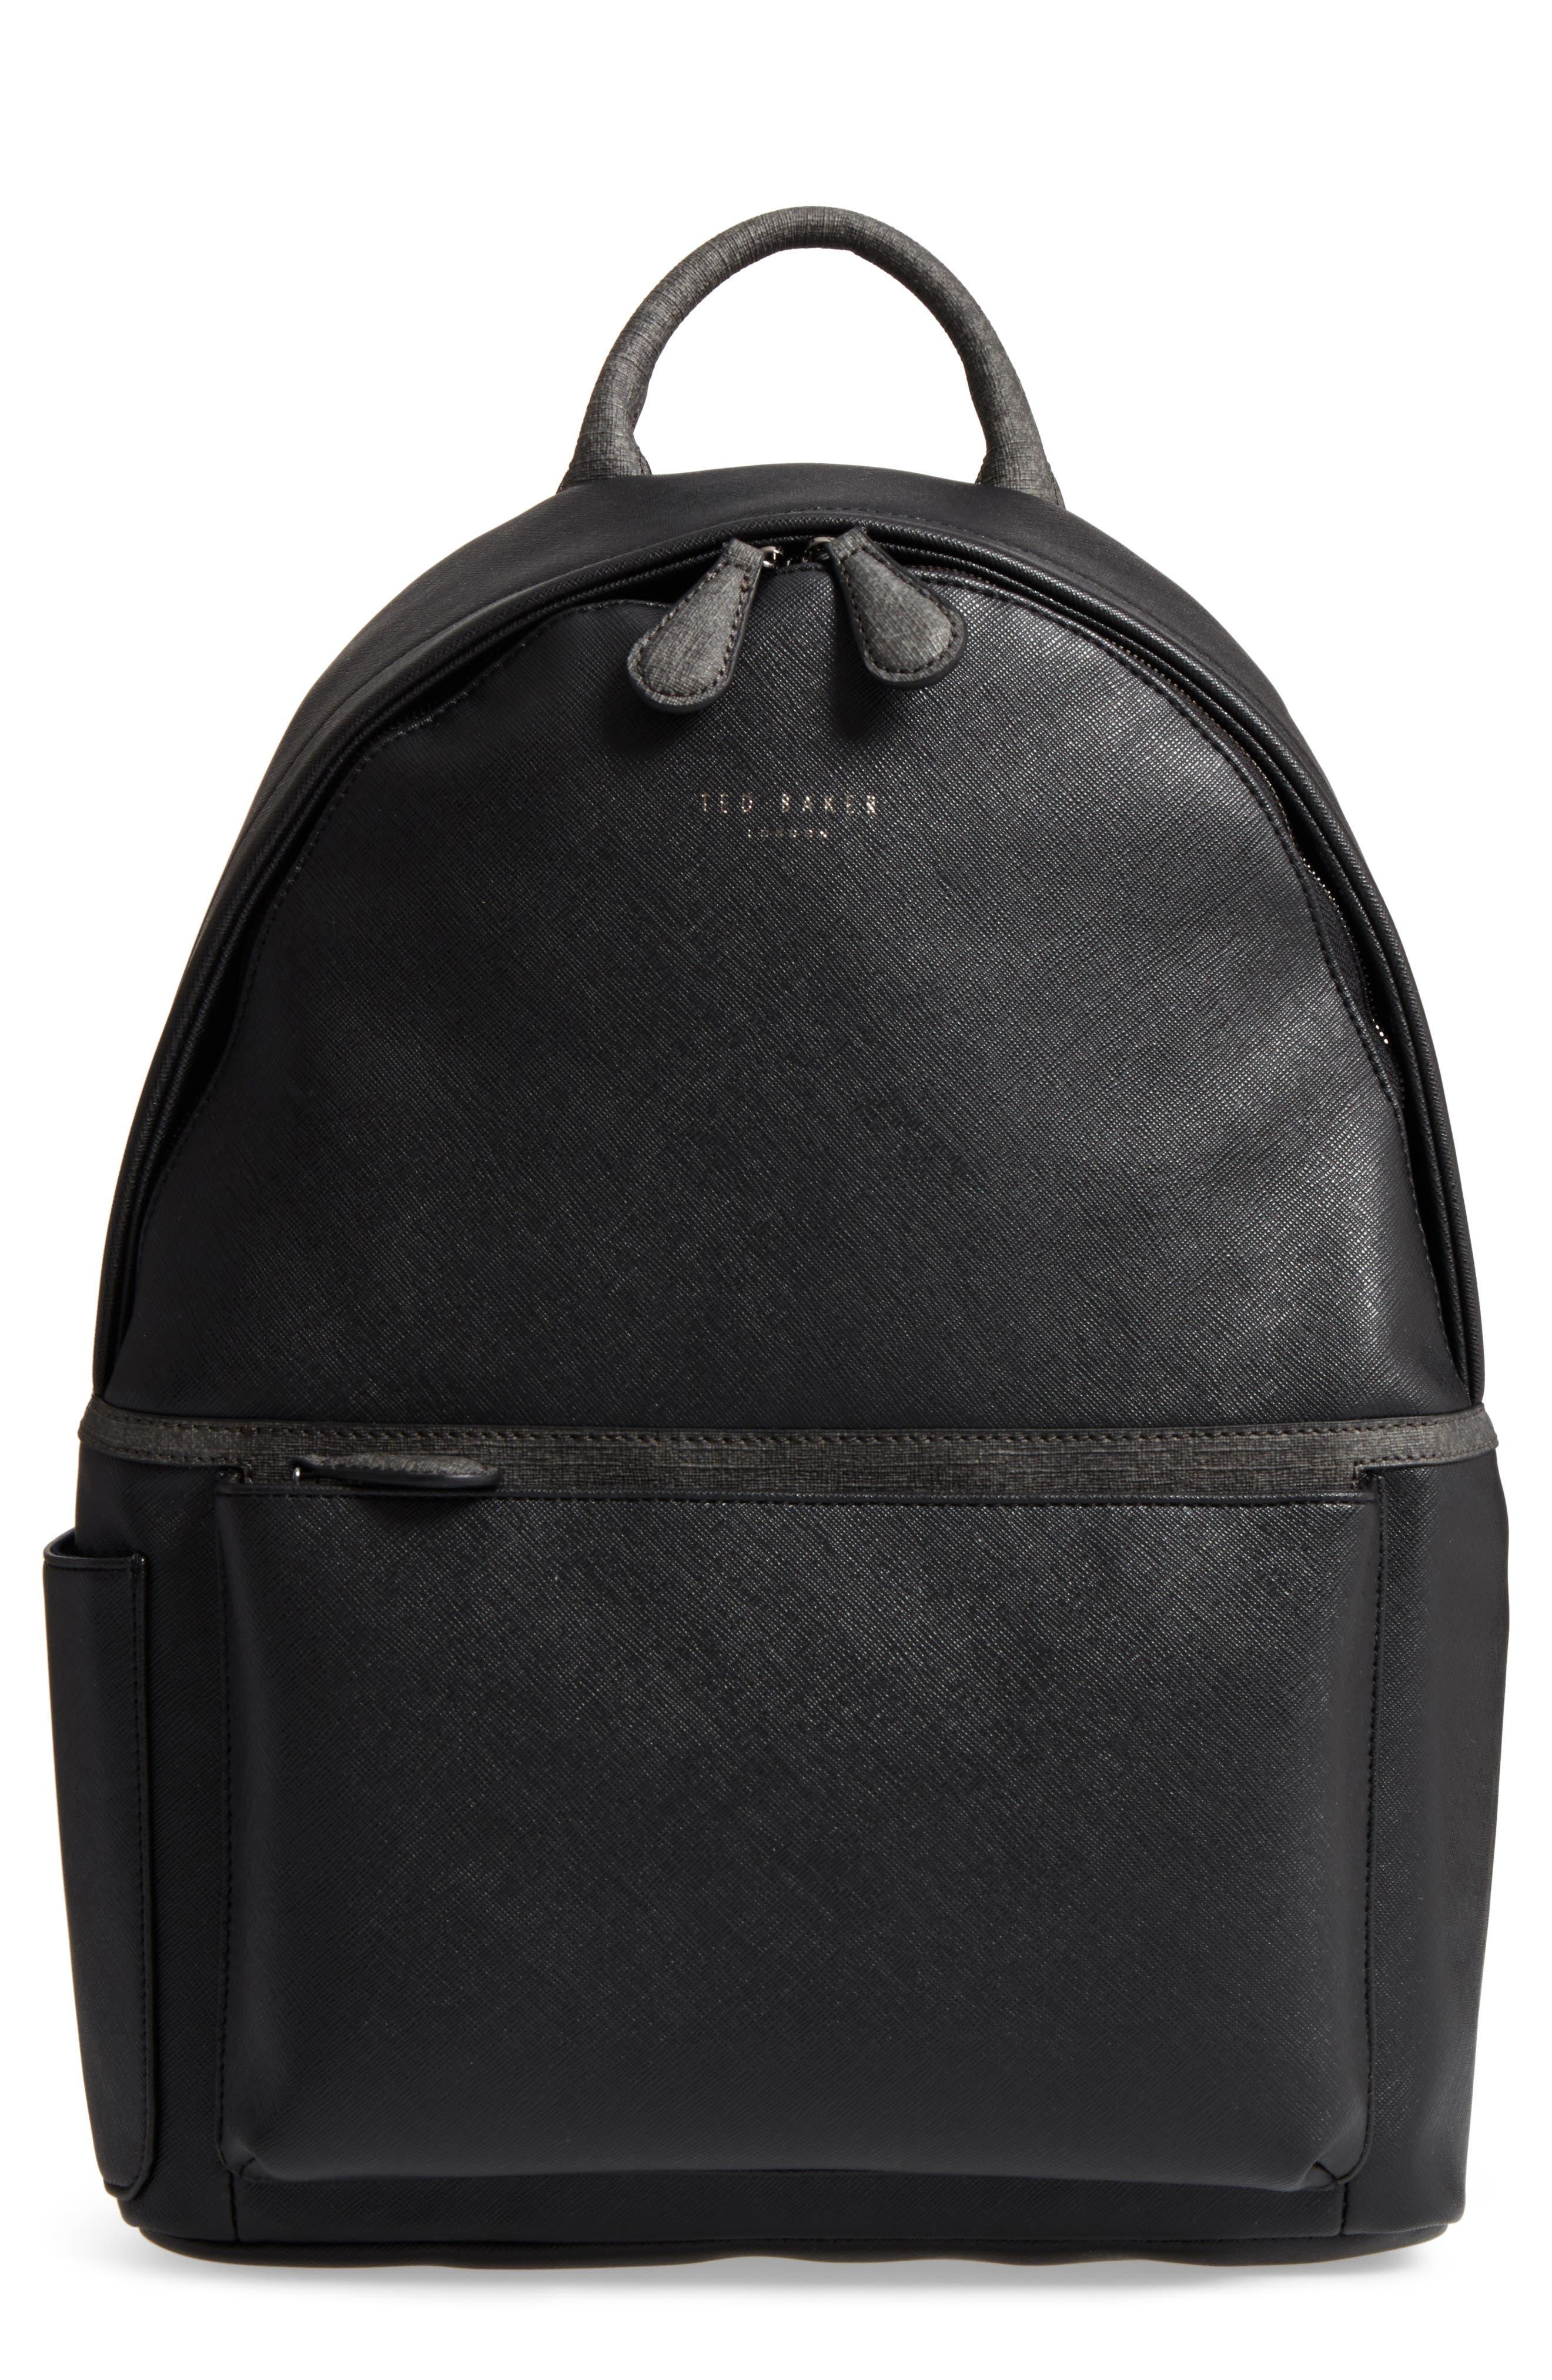 Alternate Image 1 Selected - Ted Baker London Fangs Backpack